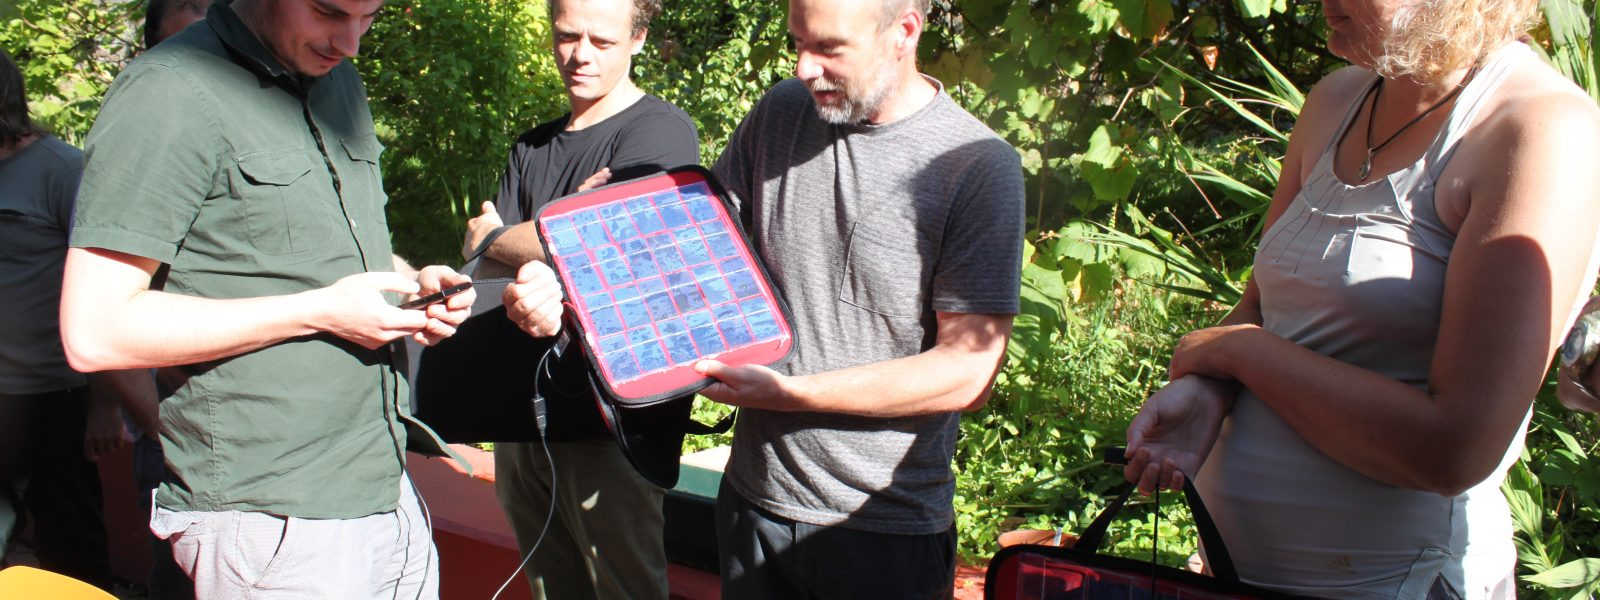 Solar panel making workshop at the Bridge, Ore